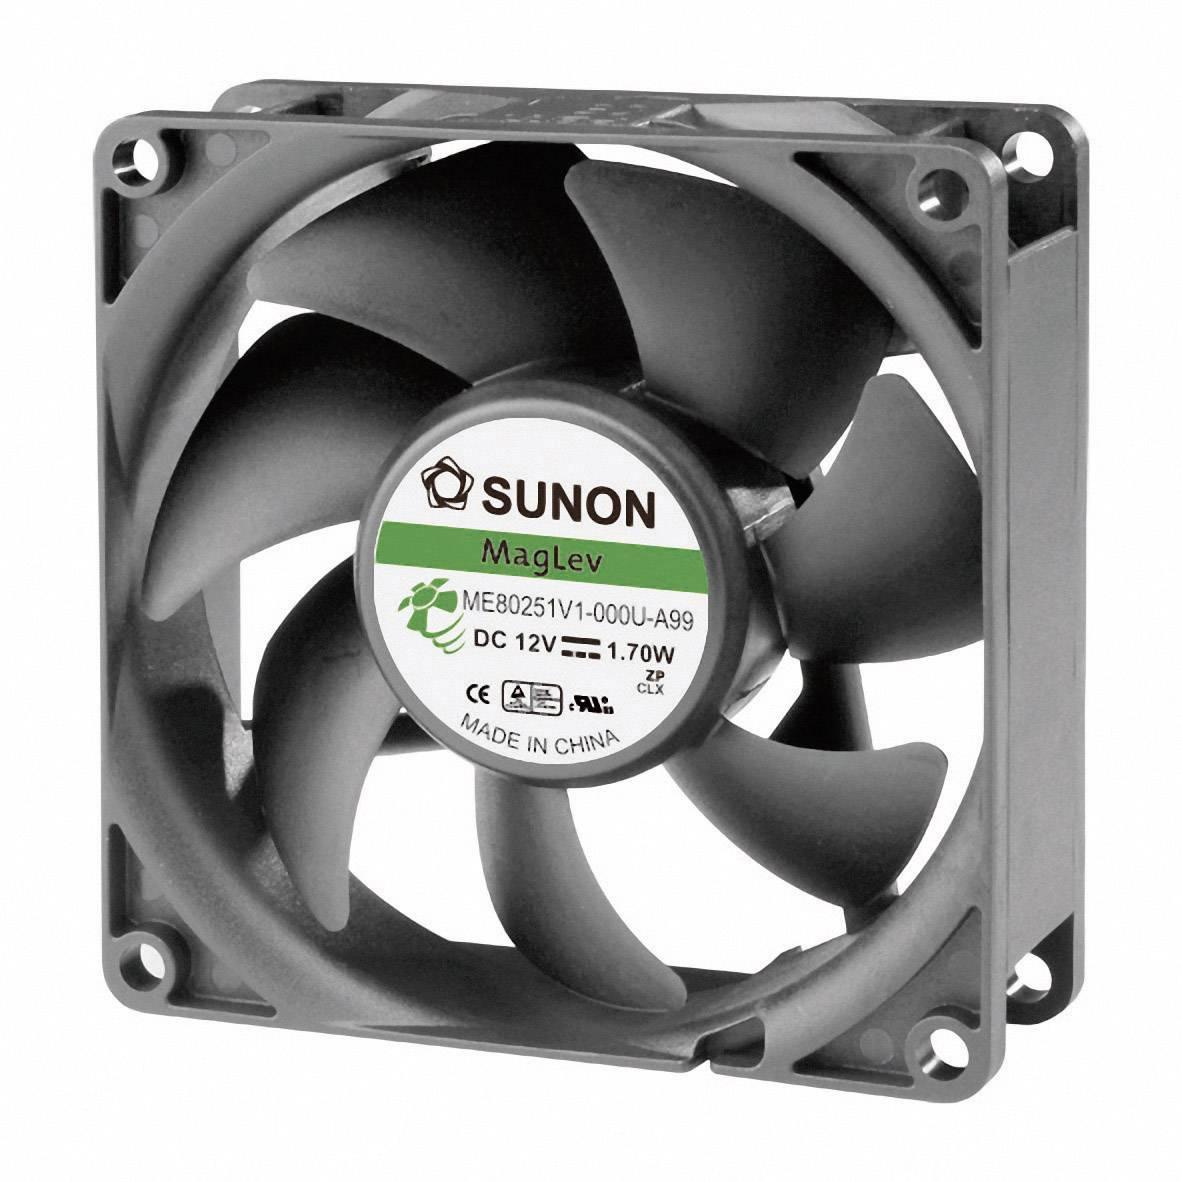 Ventilátor Sunon DR ME80251V1-000U-A99, 80 x 80 x 25 mm, 12 V/DC